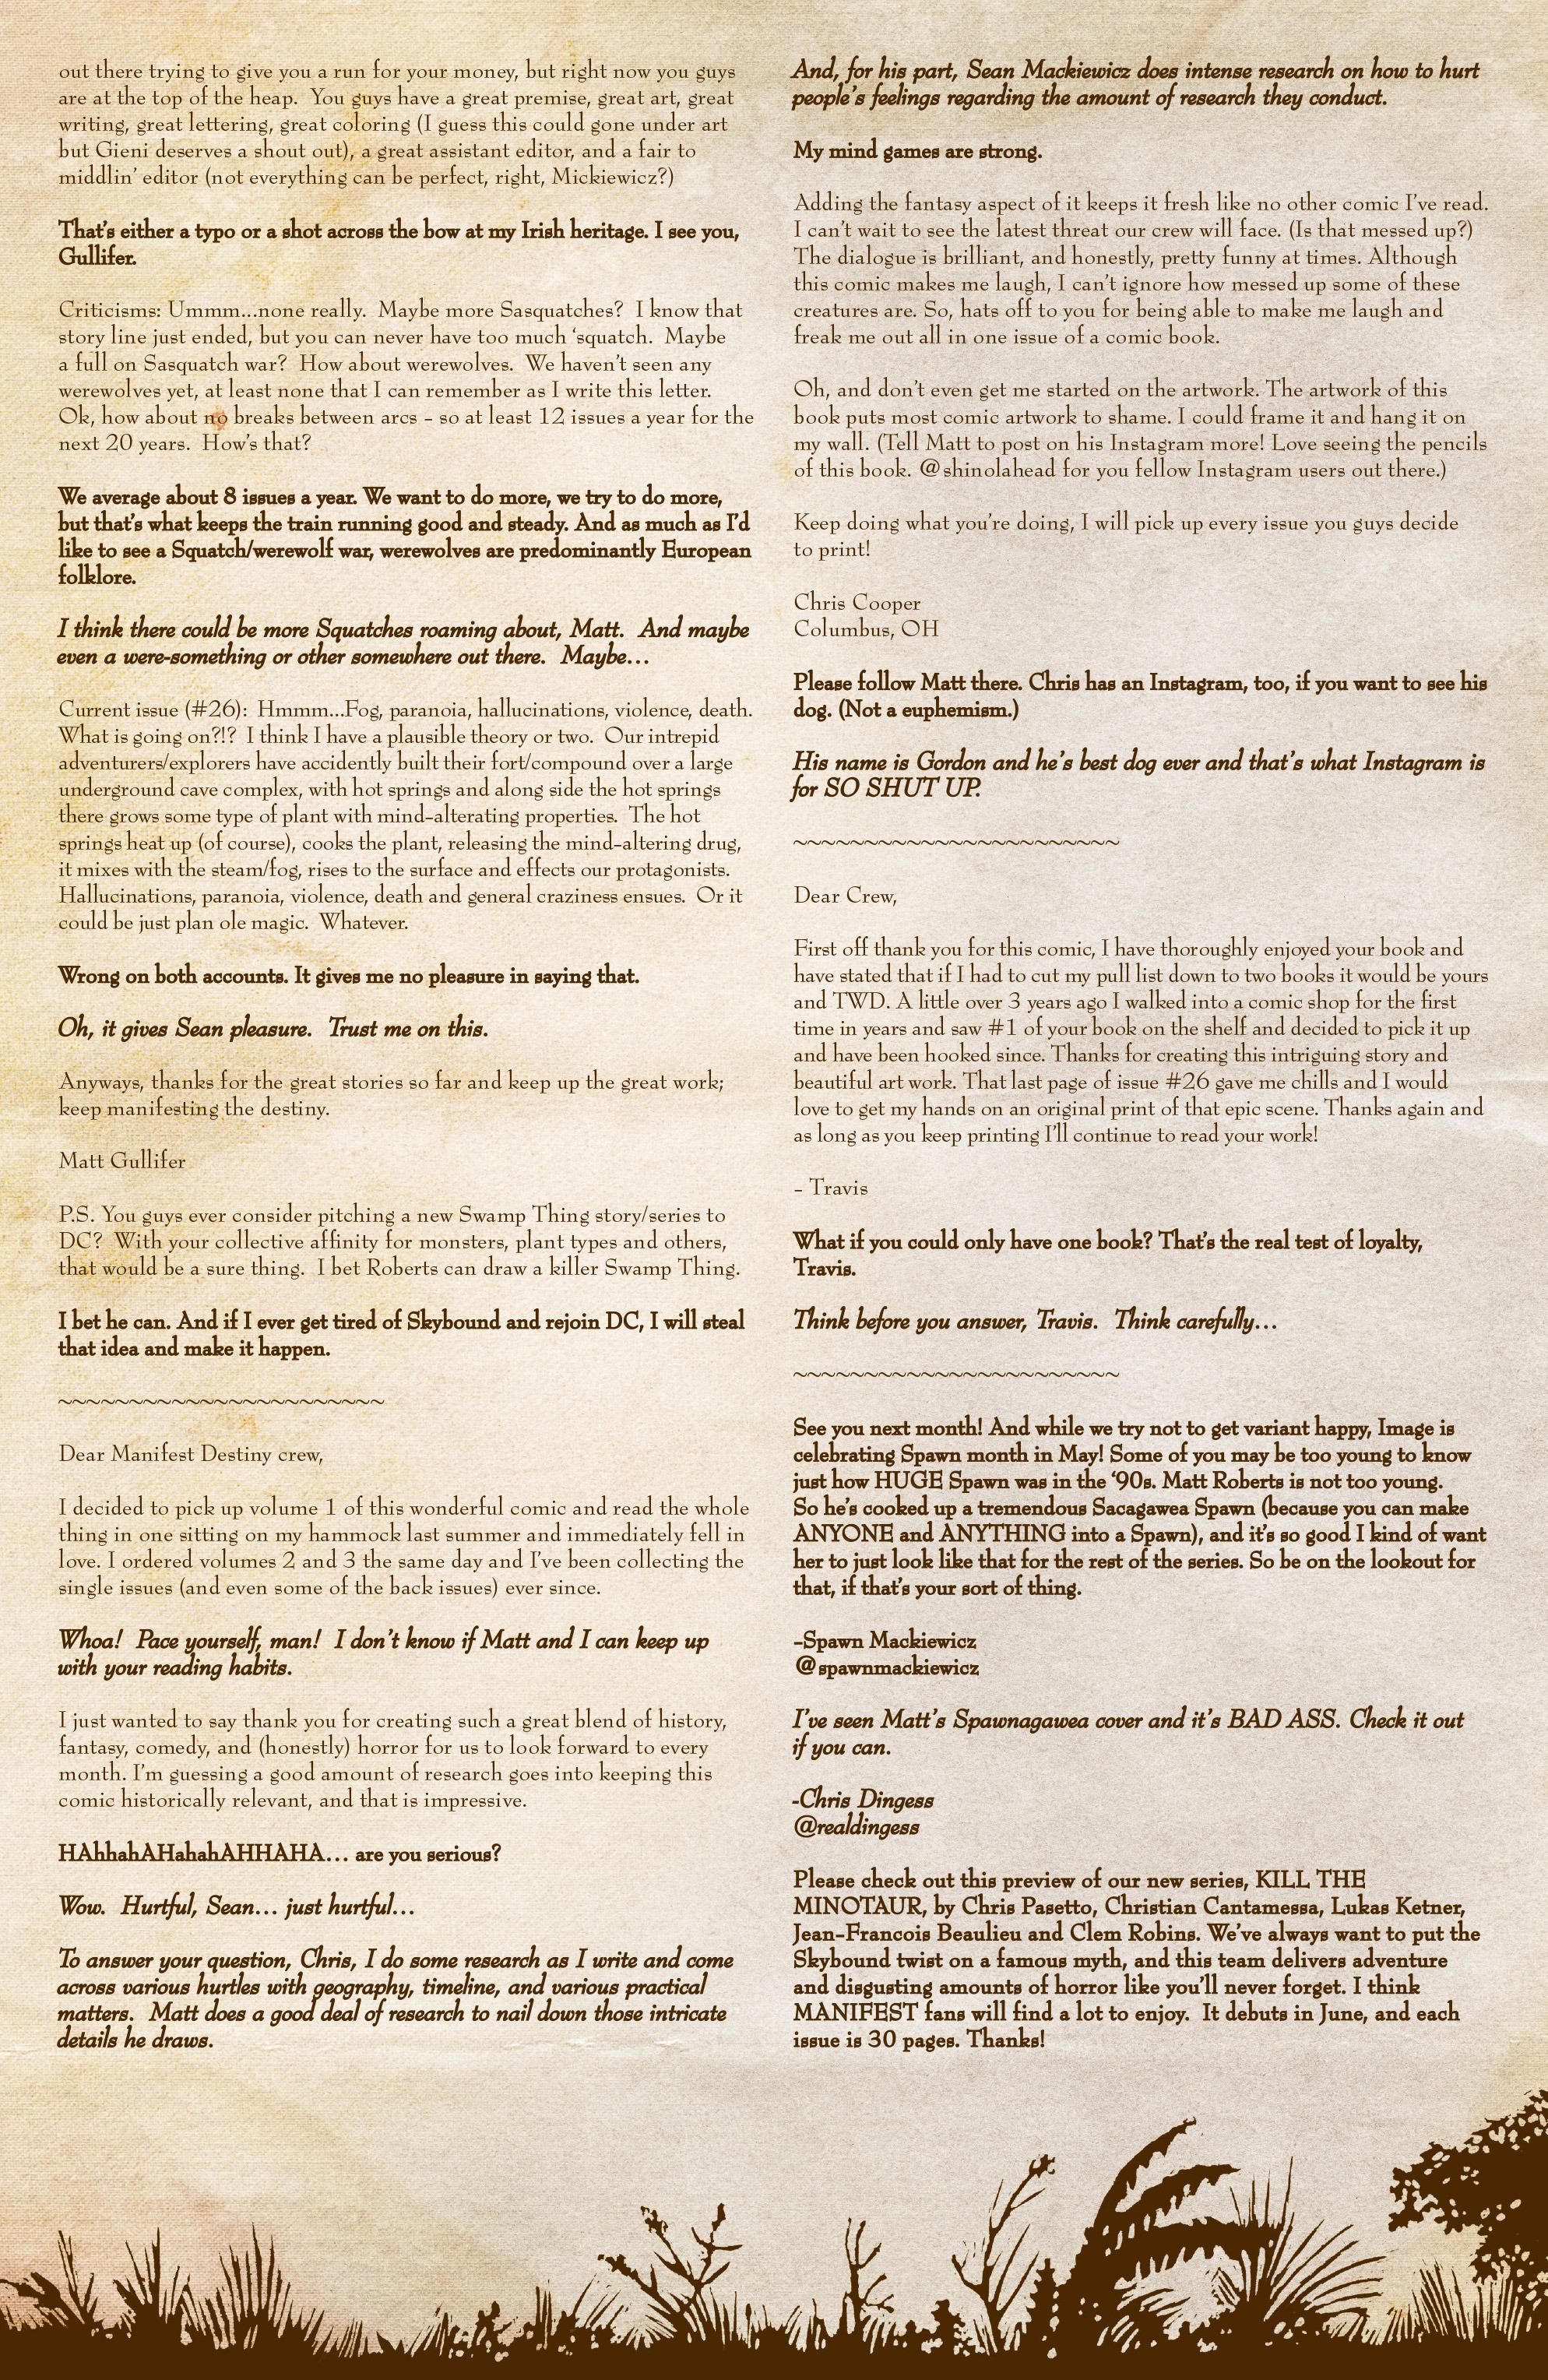 Read online Manifest Destiny comic -  Issue #28 - 24